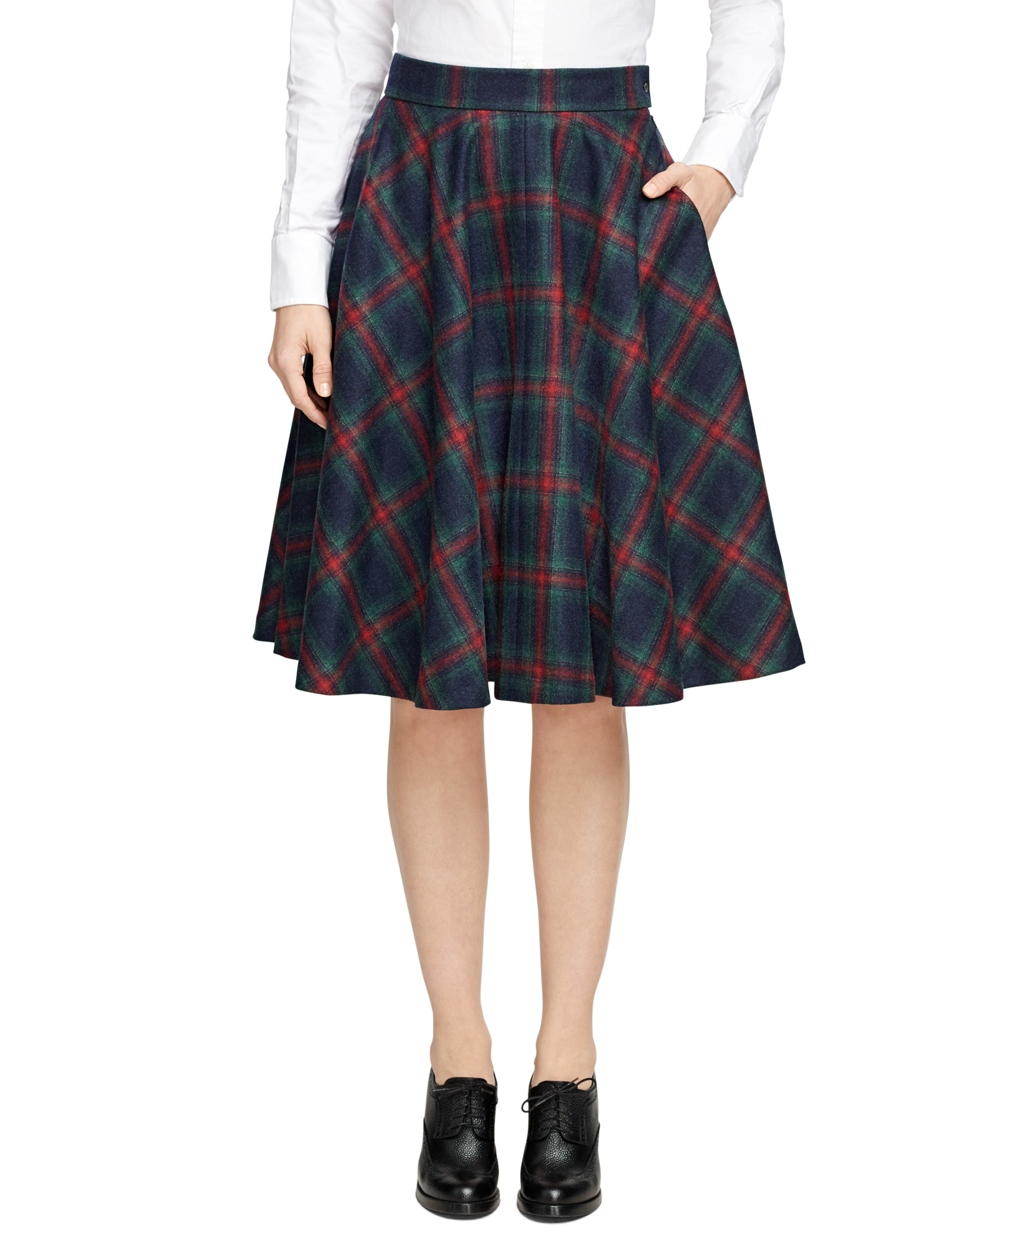 blue plaid skirt wallpaper